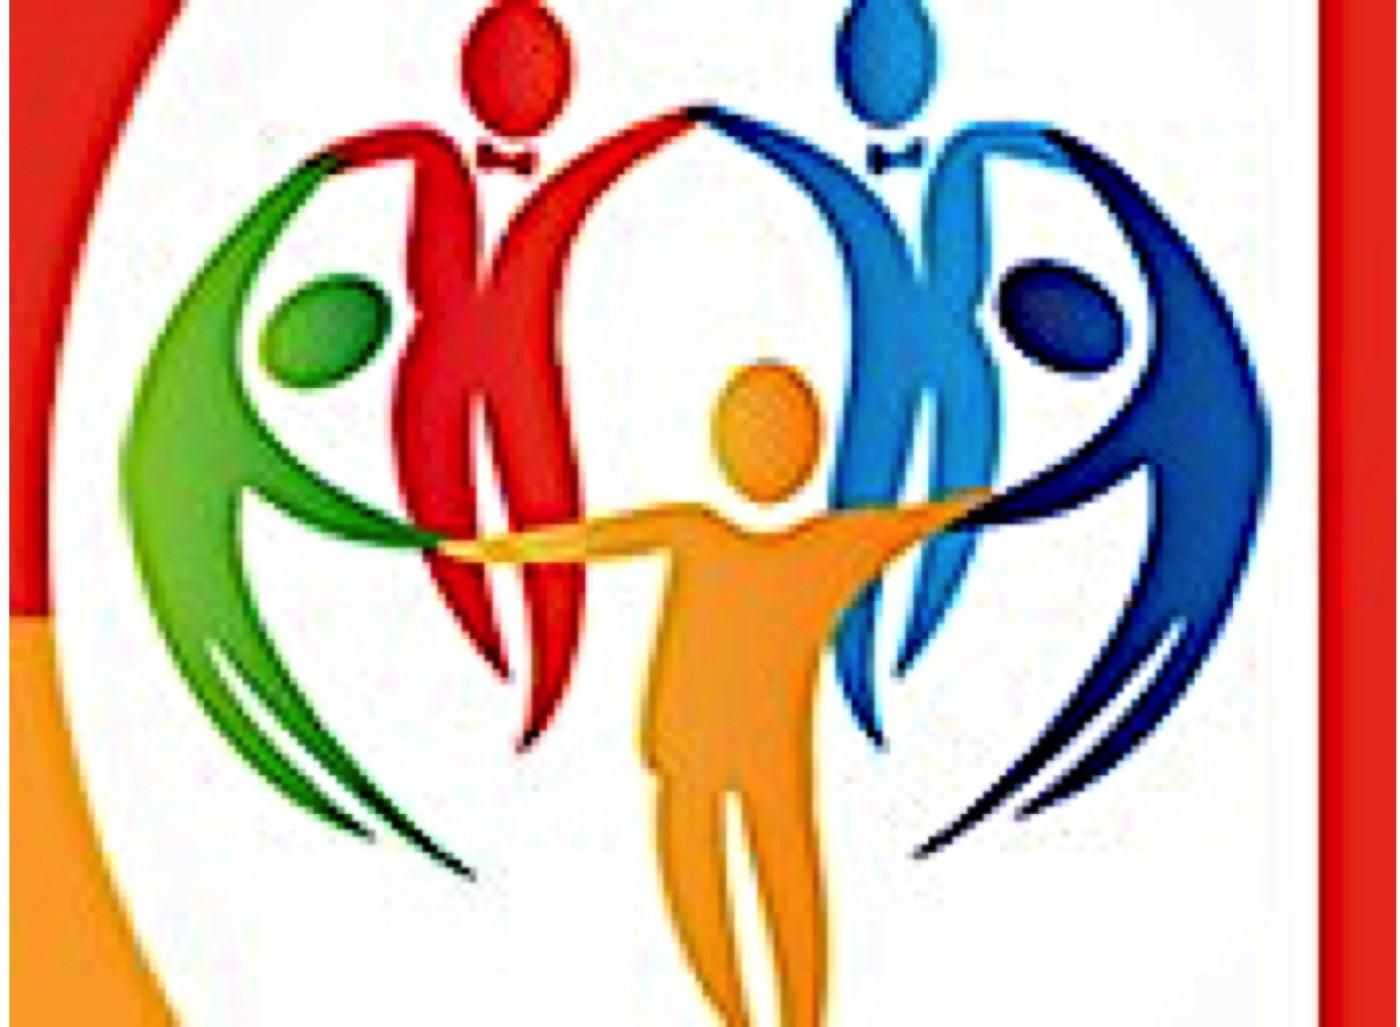 1400x1027 Reminder City Of Edmonds Seeks Diversity Commission Member